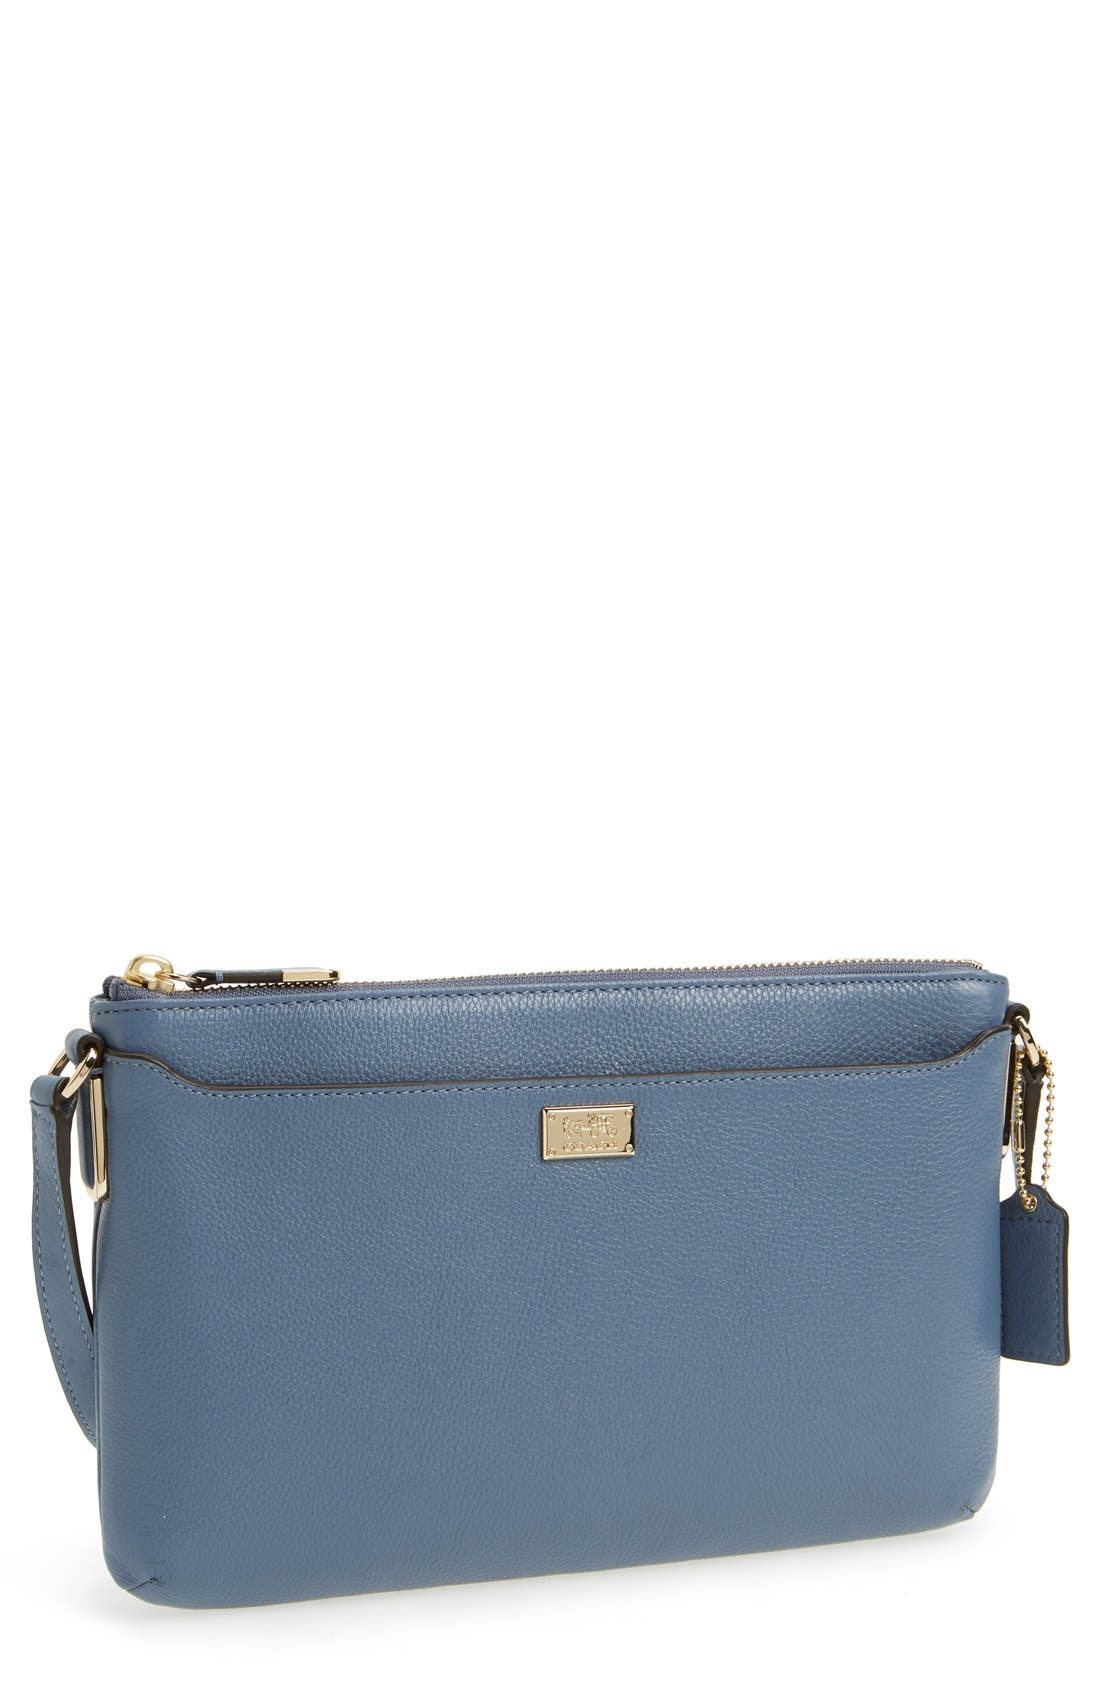 Alternate Image 1 Selected - COACH 'Madison - New Swingpack' Leather Crossbody Bag